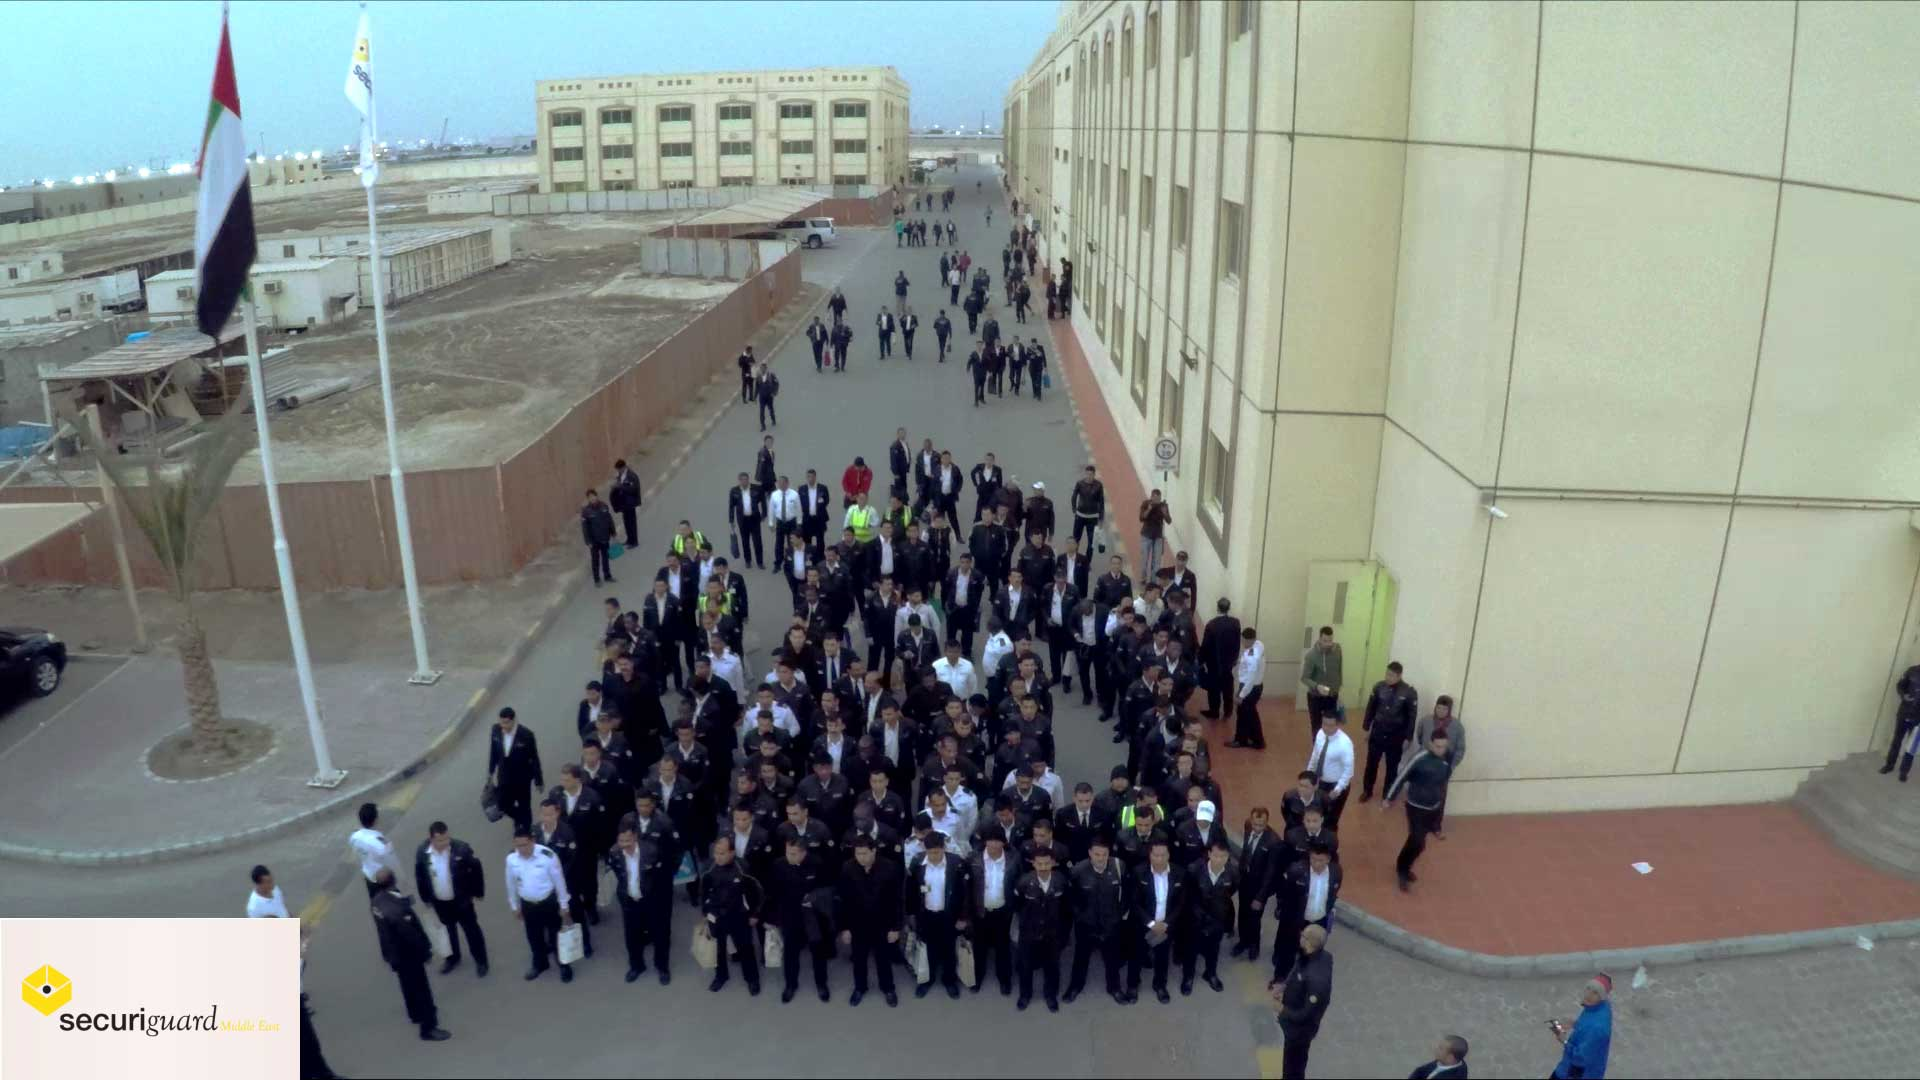 Securiguard Middle East corporate video Abu Dhabi